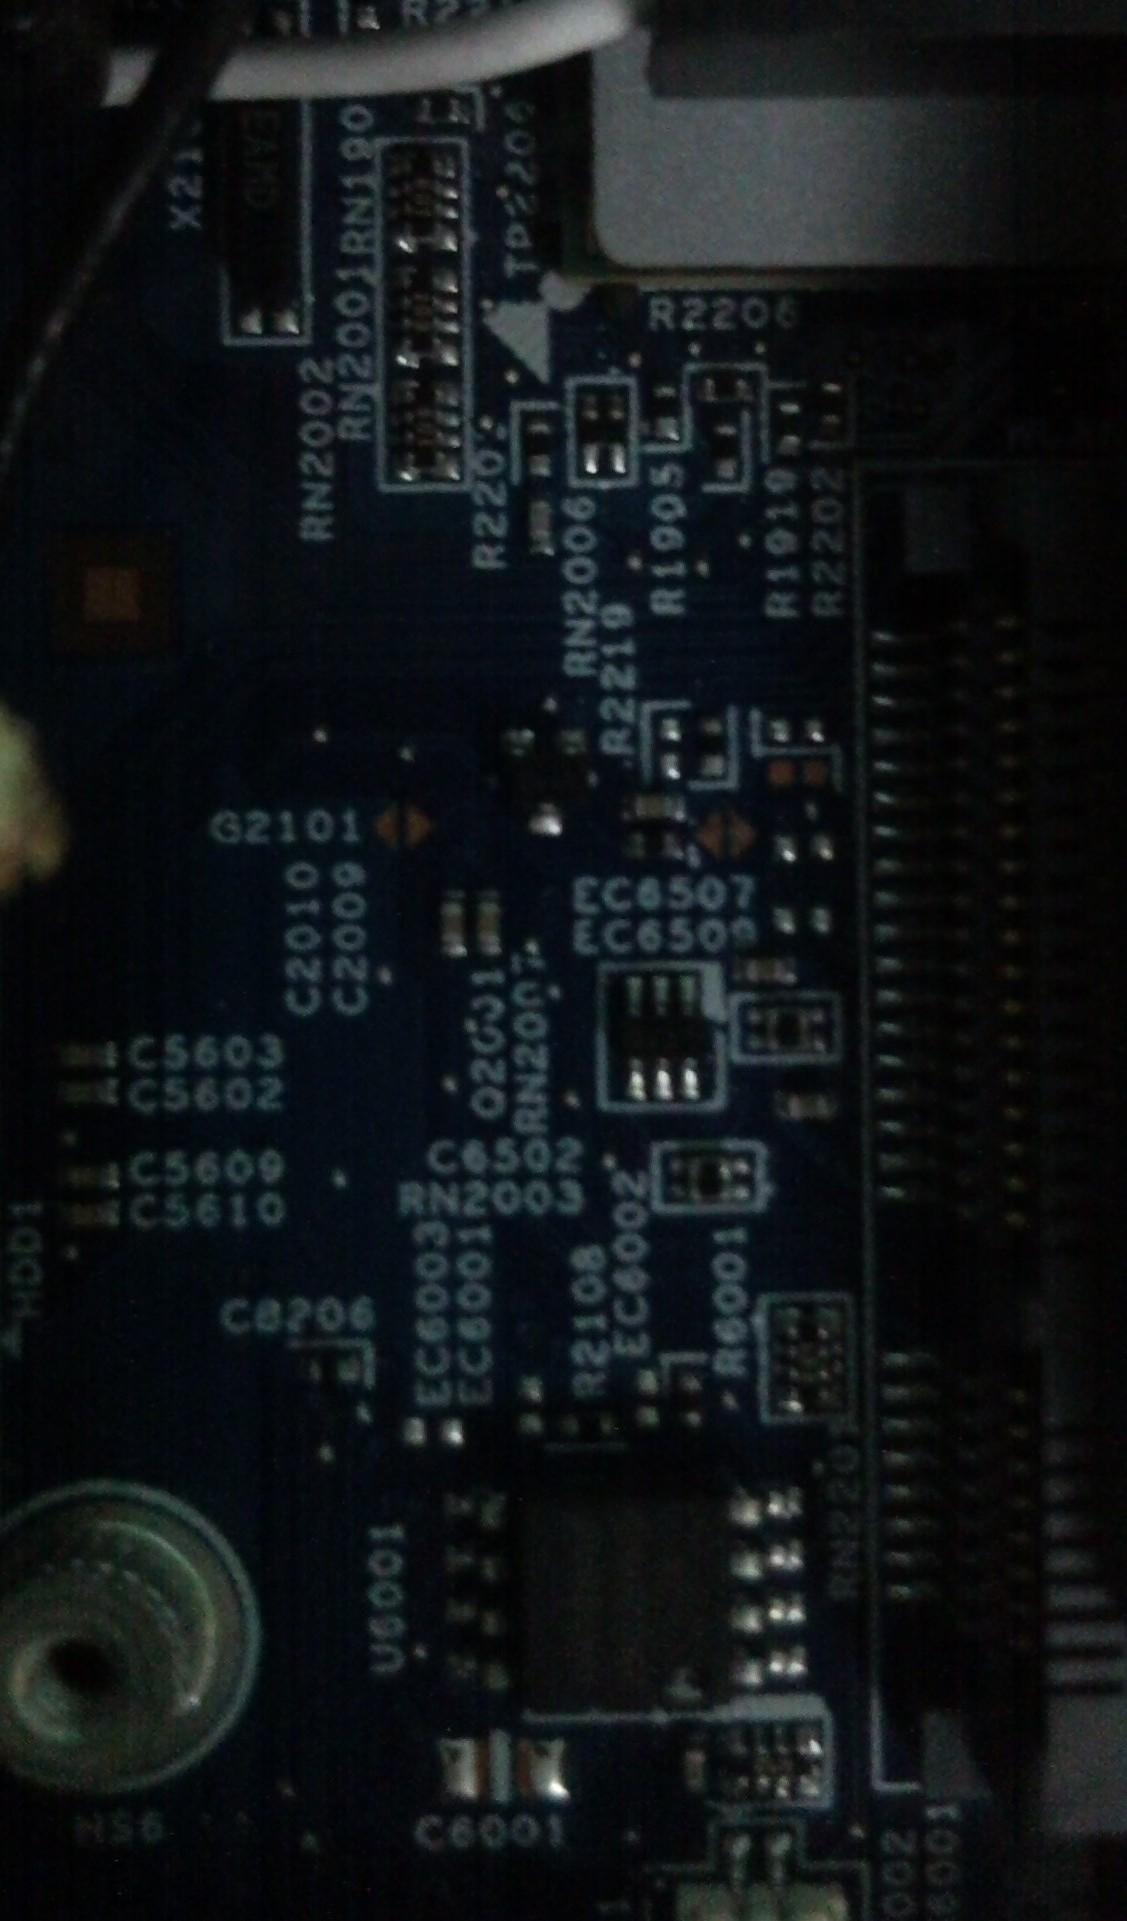 Acer Aspire 4752 - BIOS progress bar stuck at about 75